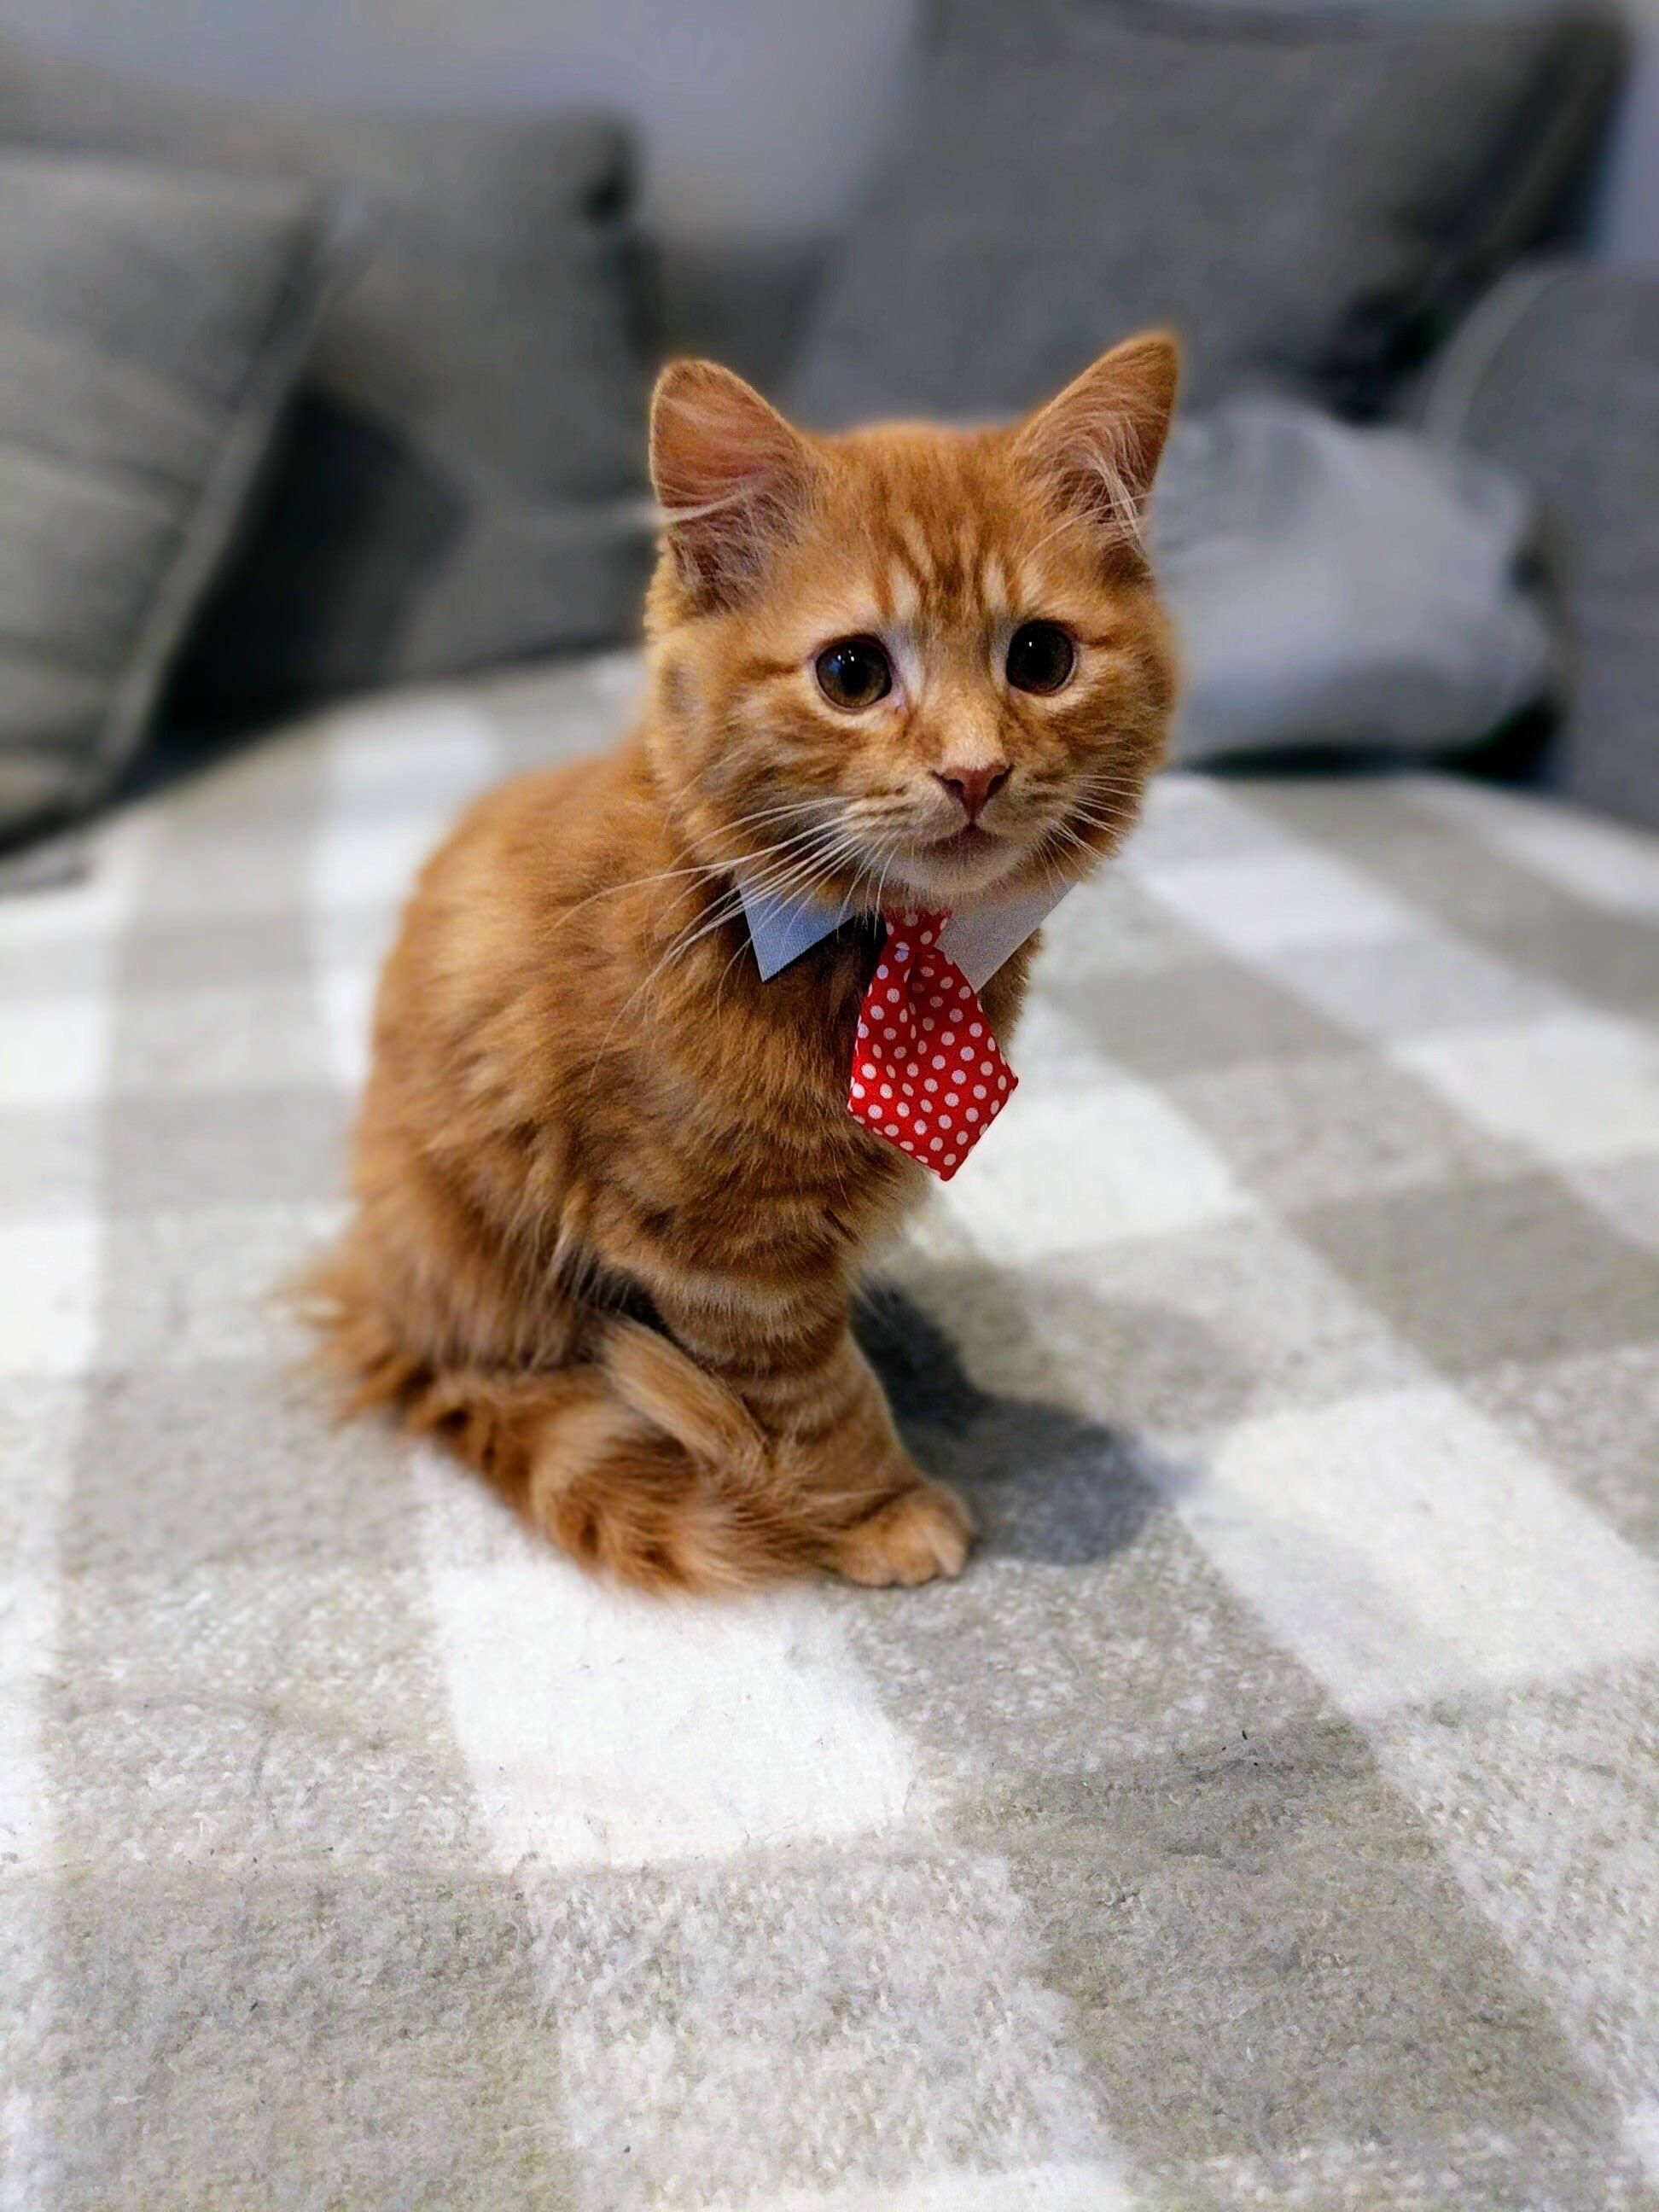 Pin By Emma Zanaboni On Animals Kittens Cutest Pretty Cats Cute Animals